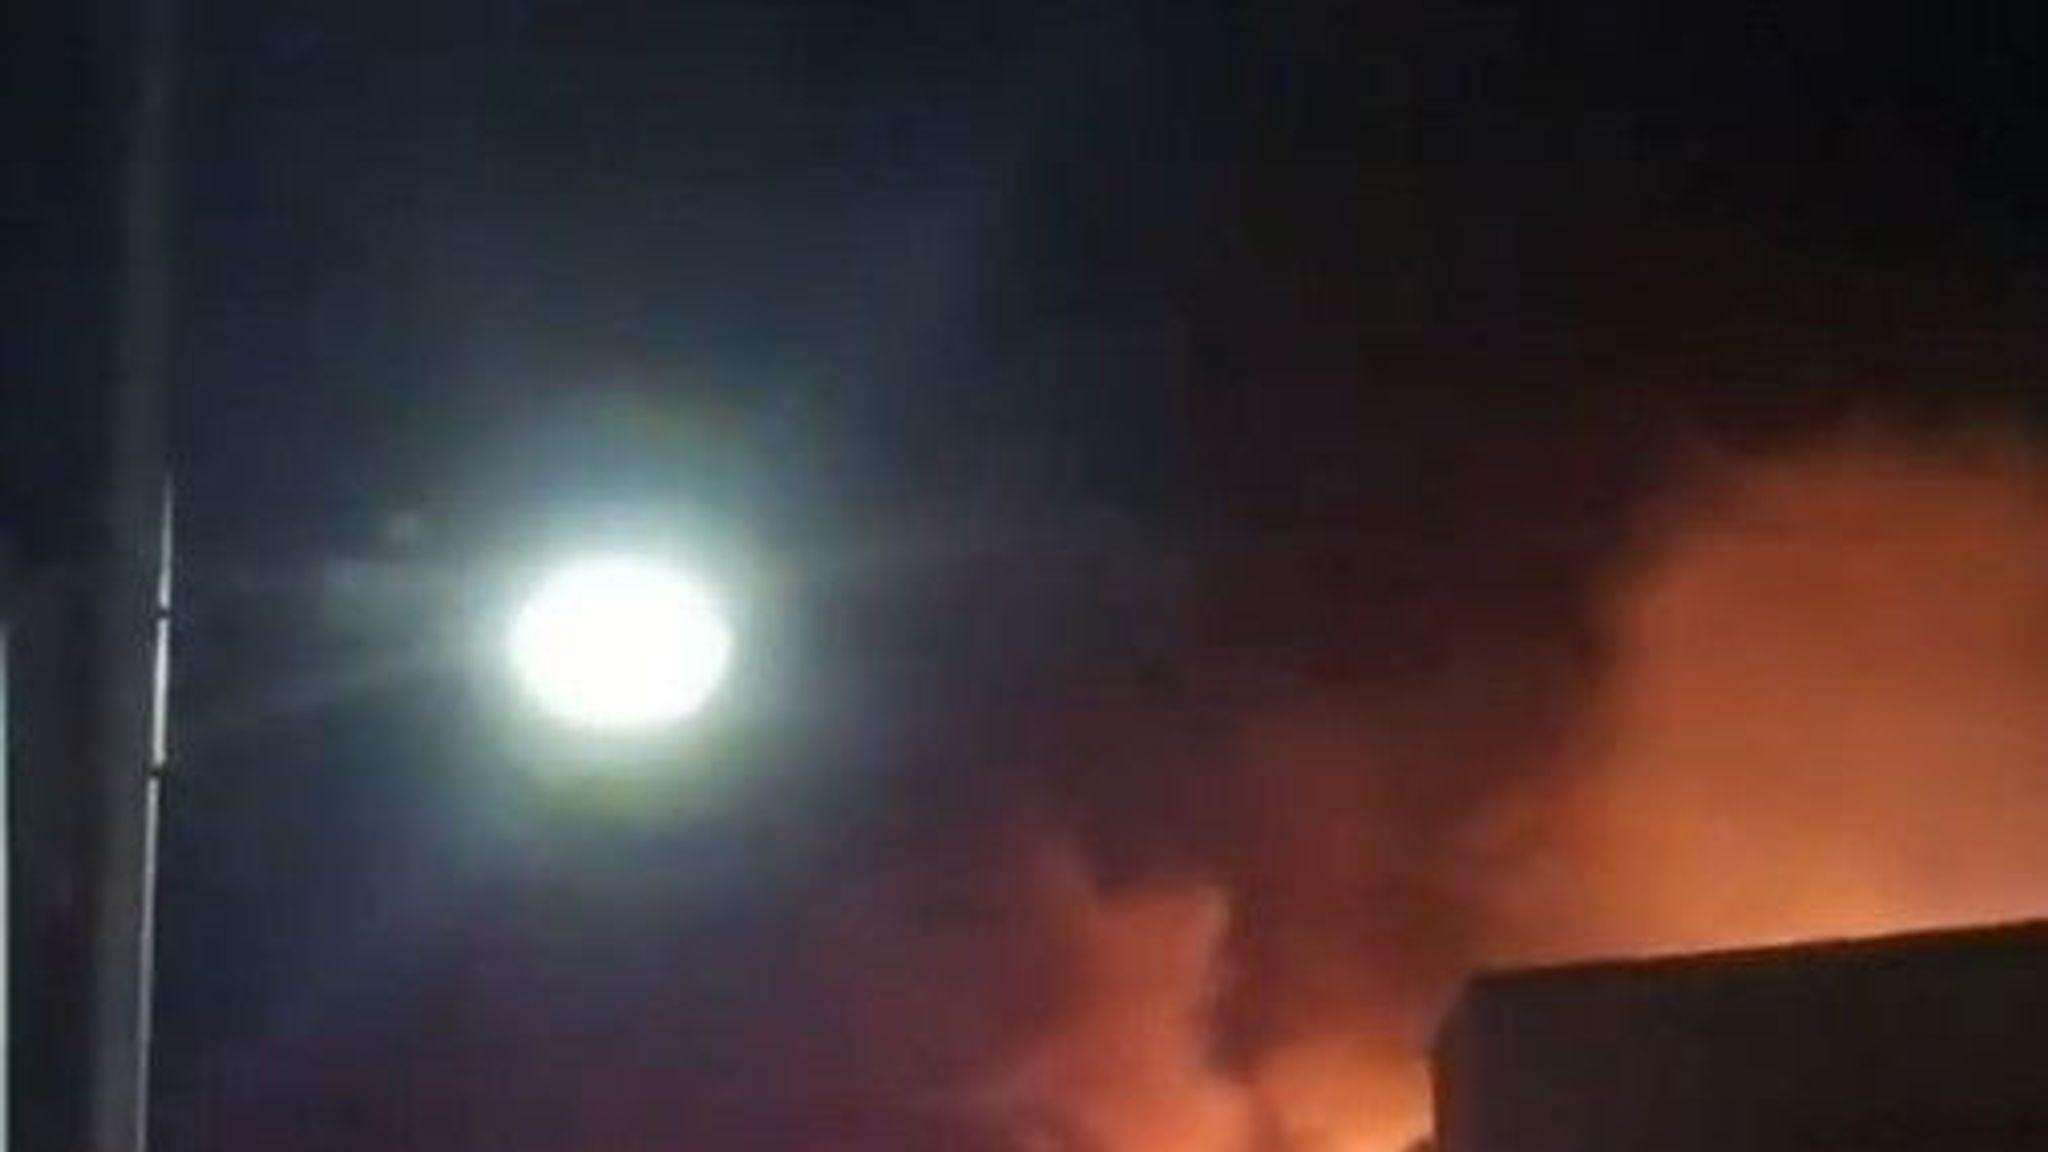 40 fire crews tackling flames 'crawling up cladding' at student flats